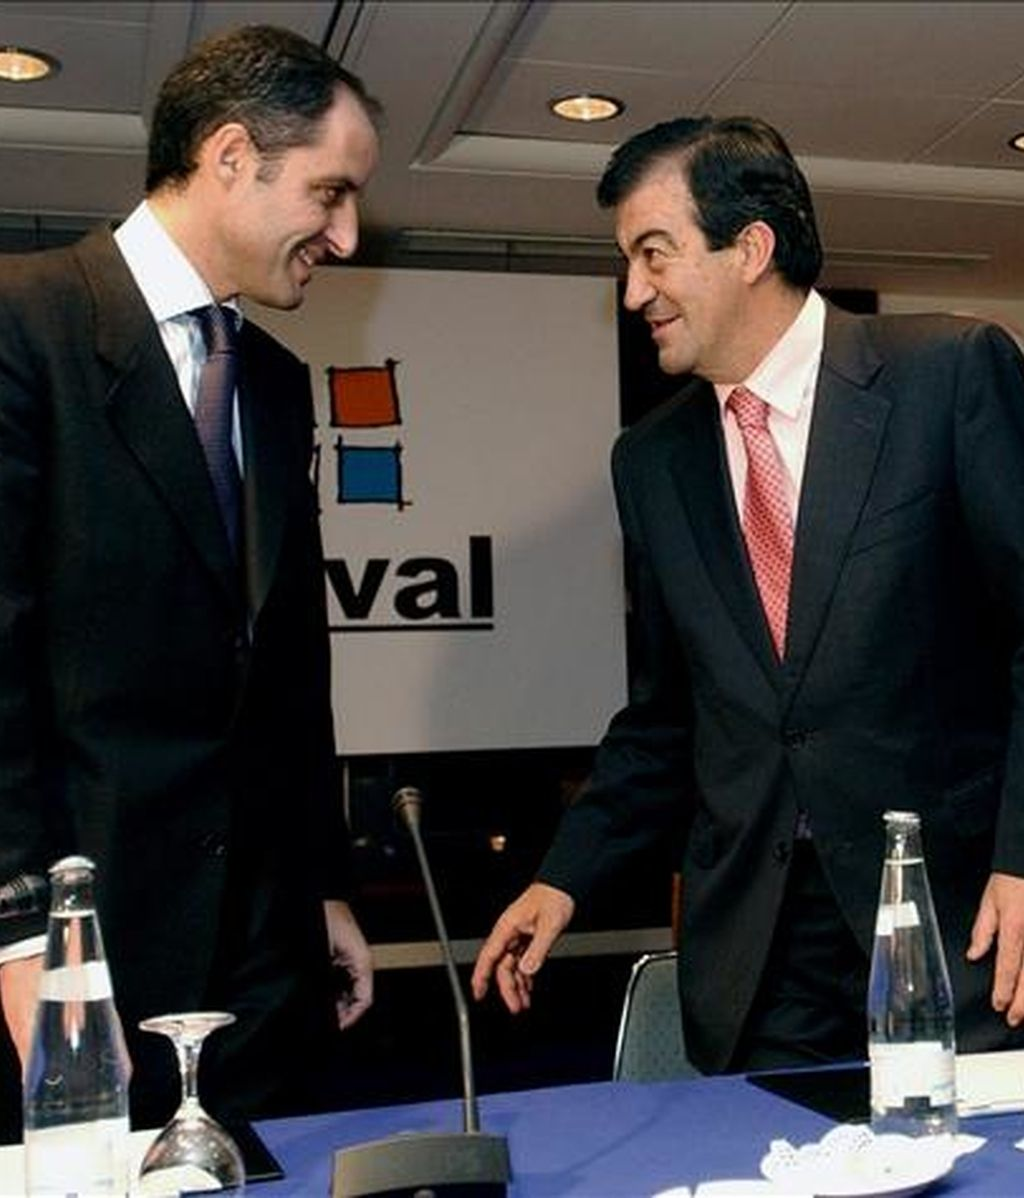 El presidente de la Generalitat, Francisco Camps (I) junto a Francisco Álvarez Cascos. EFE/Archivo